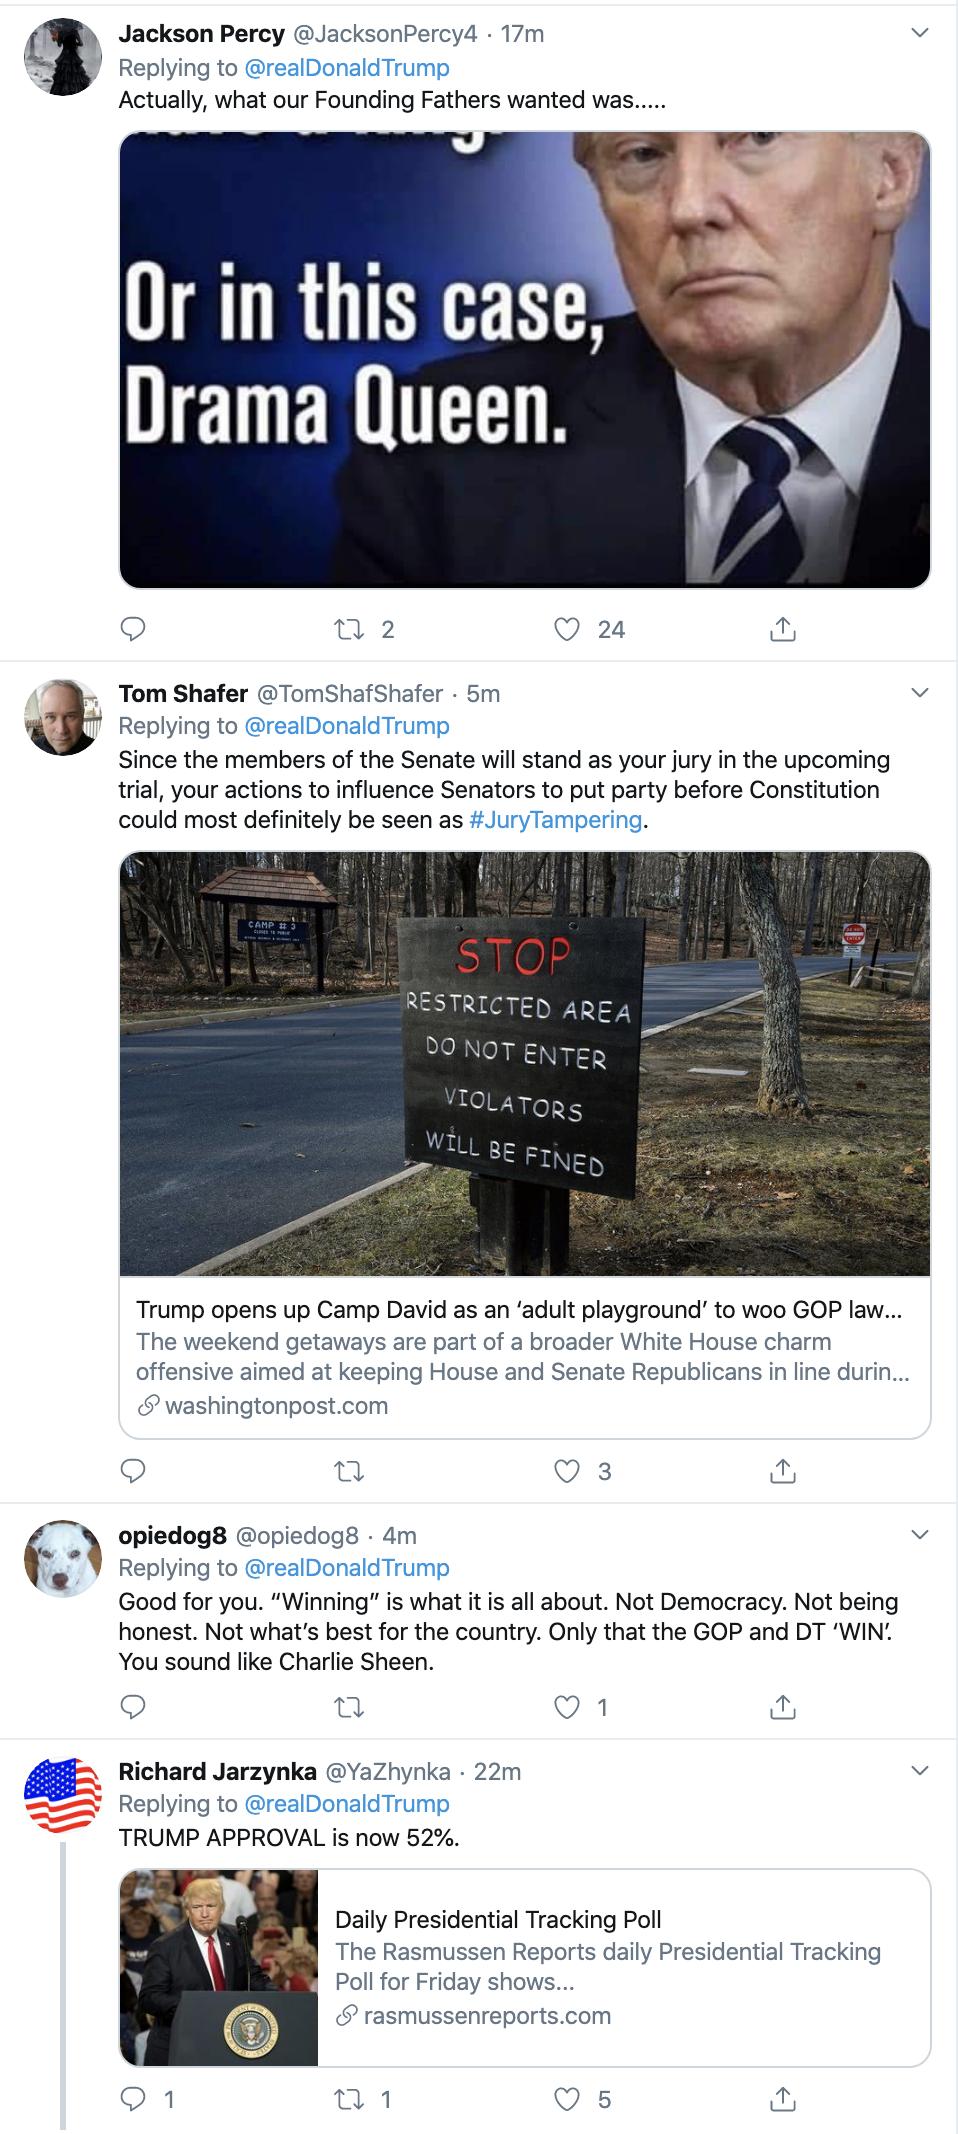 Screen-Shot-2019-12-05-at-9.38.23-AM Trump Attacks Pelosi After Impeachment Articles Anouncement Donald Trump Featured Impeachment Investigation Top Stories Uncategorized